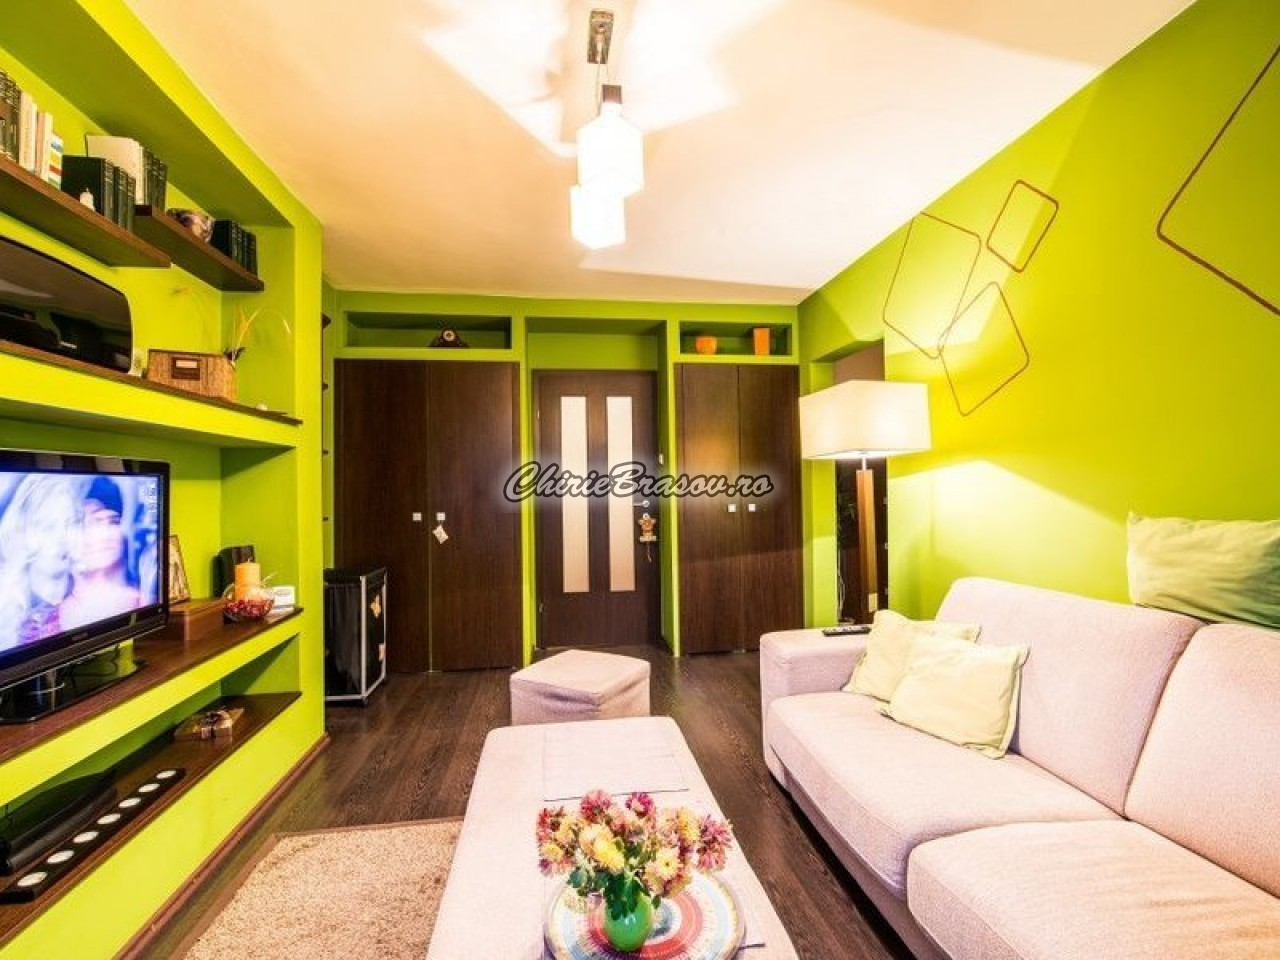 Inchiriere apartament 2 camere Brasov , Central - Grivitei-353-8